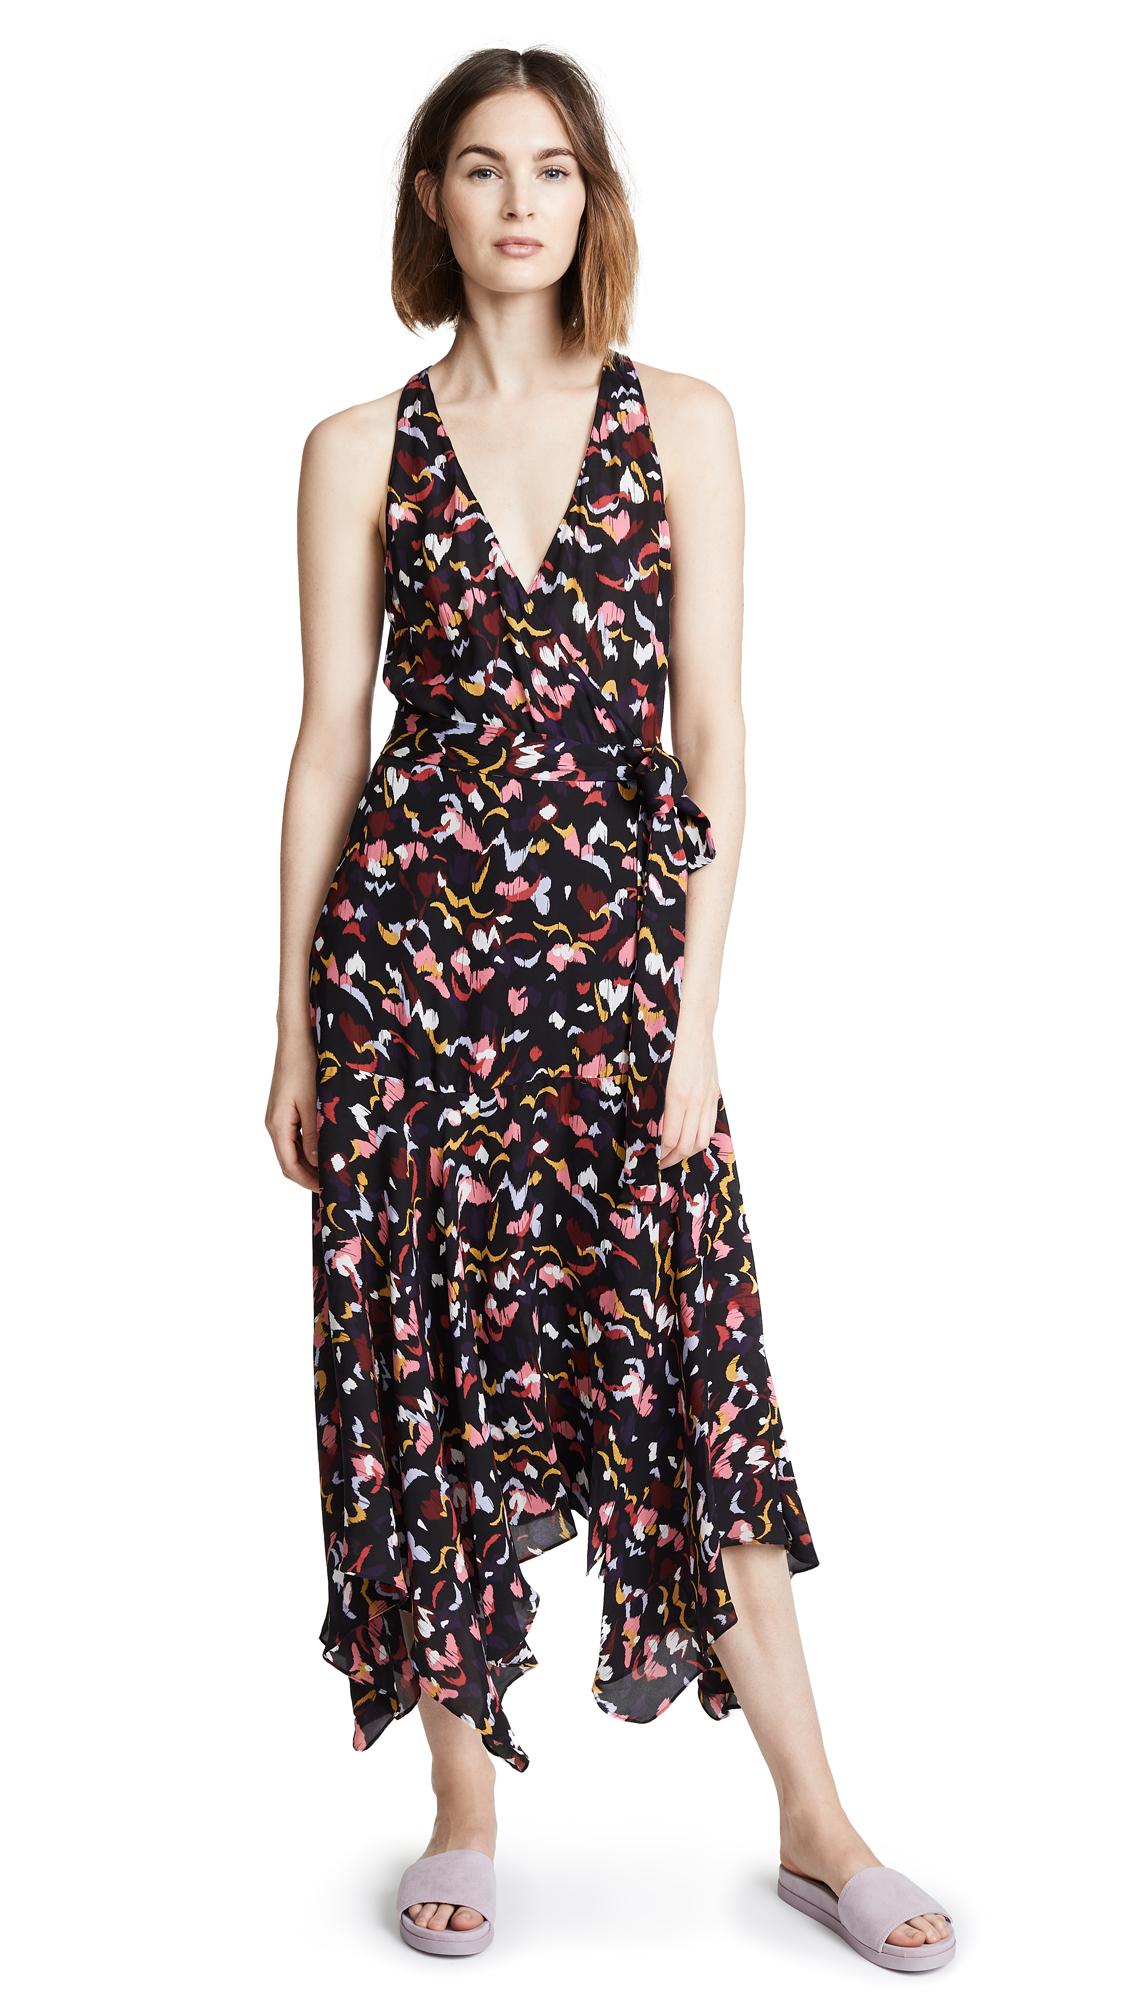 A.L.C. Rosyln Dress - Coral Multi